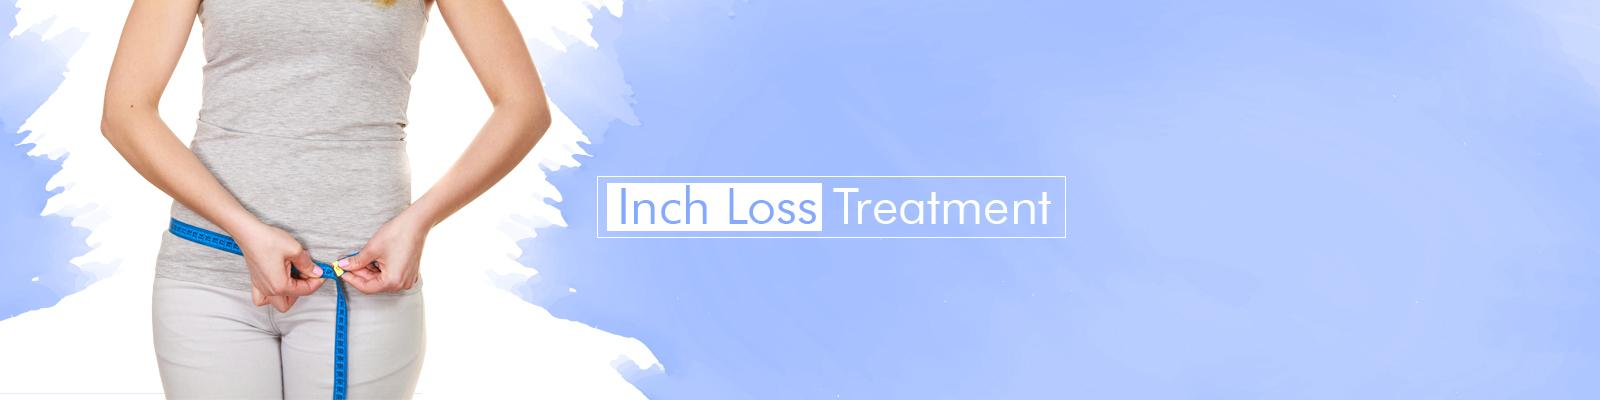 Best Inch Loss Treatment In Chennai Hyderabad Amp Bangalore